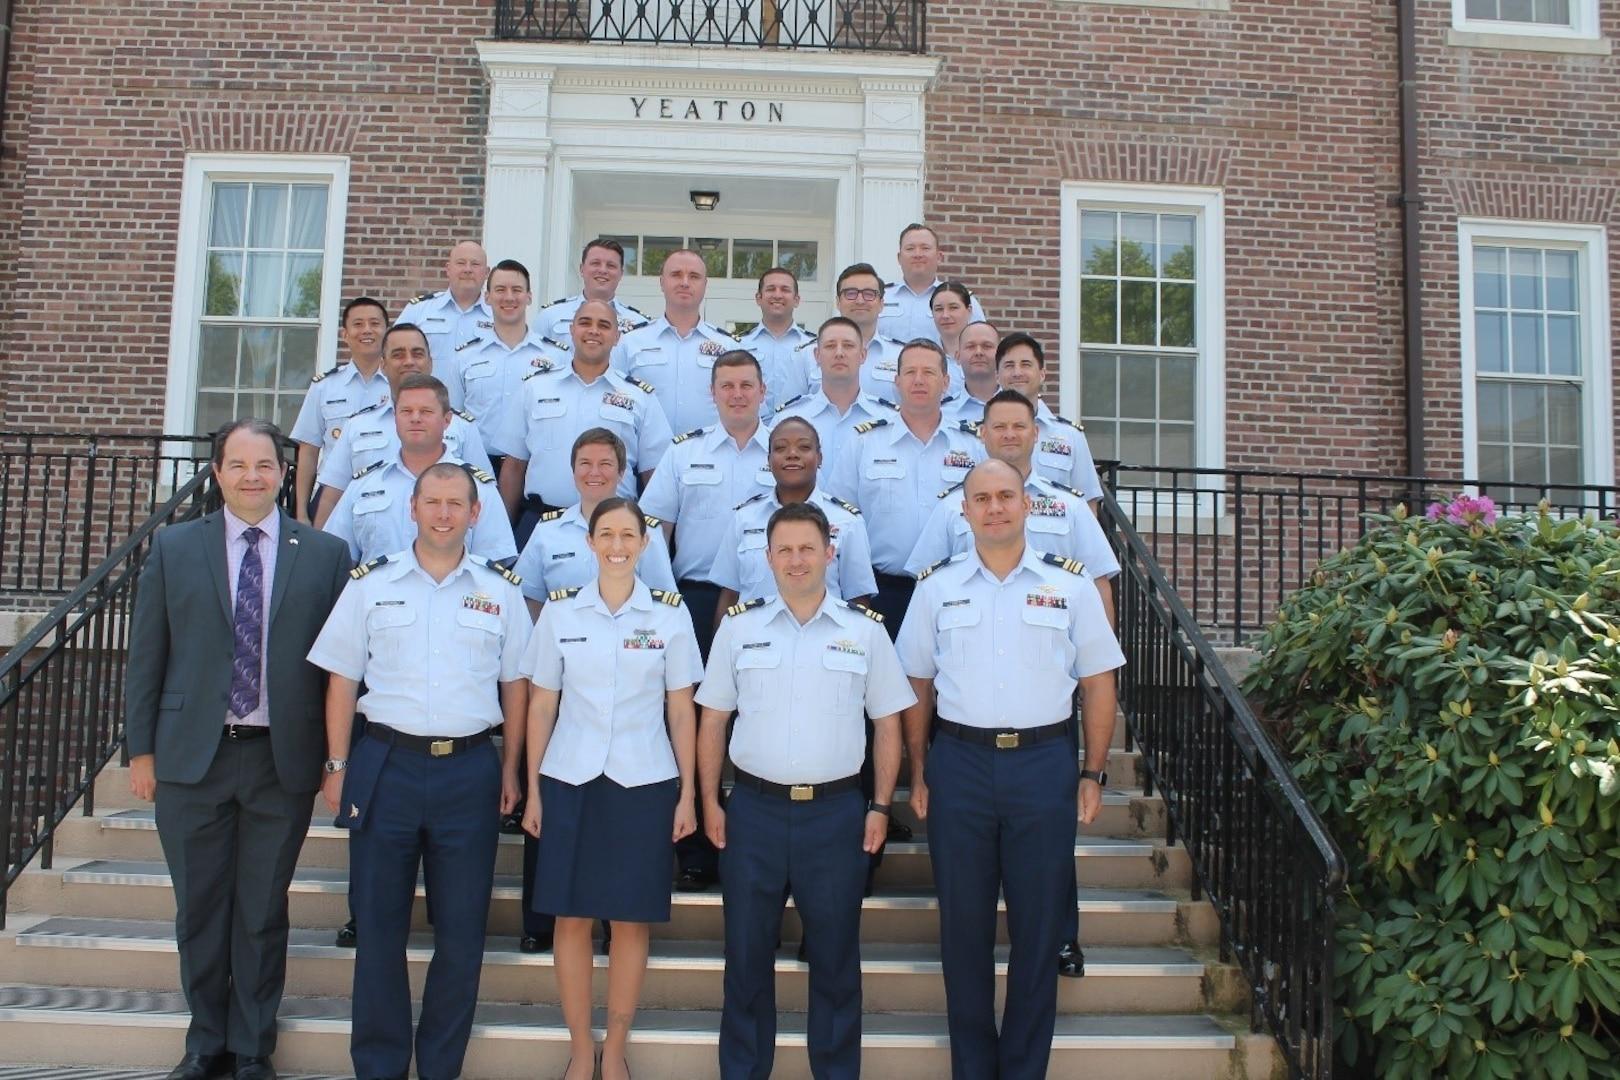 The Coast Guard Leadership Development Center Pilots Inaugural Senior Leader Transition Course (SLTC) Class Photo, June 2021. (Coast Guard photo)